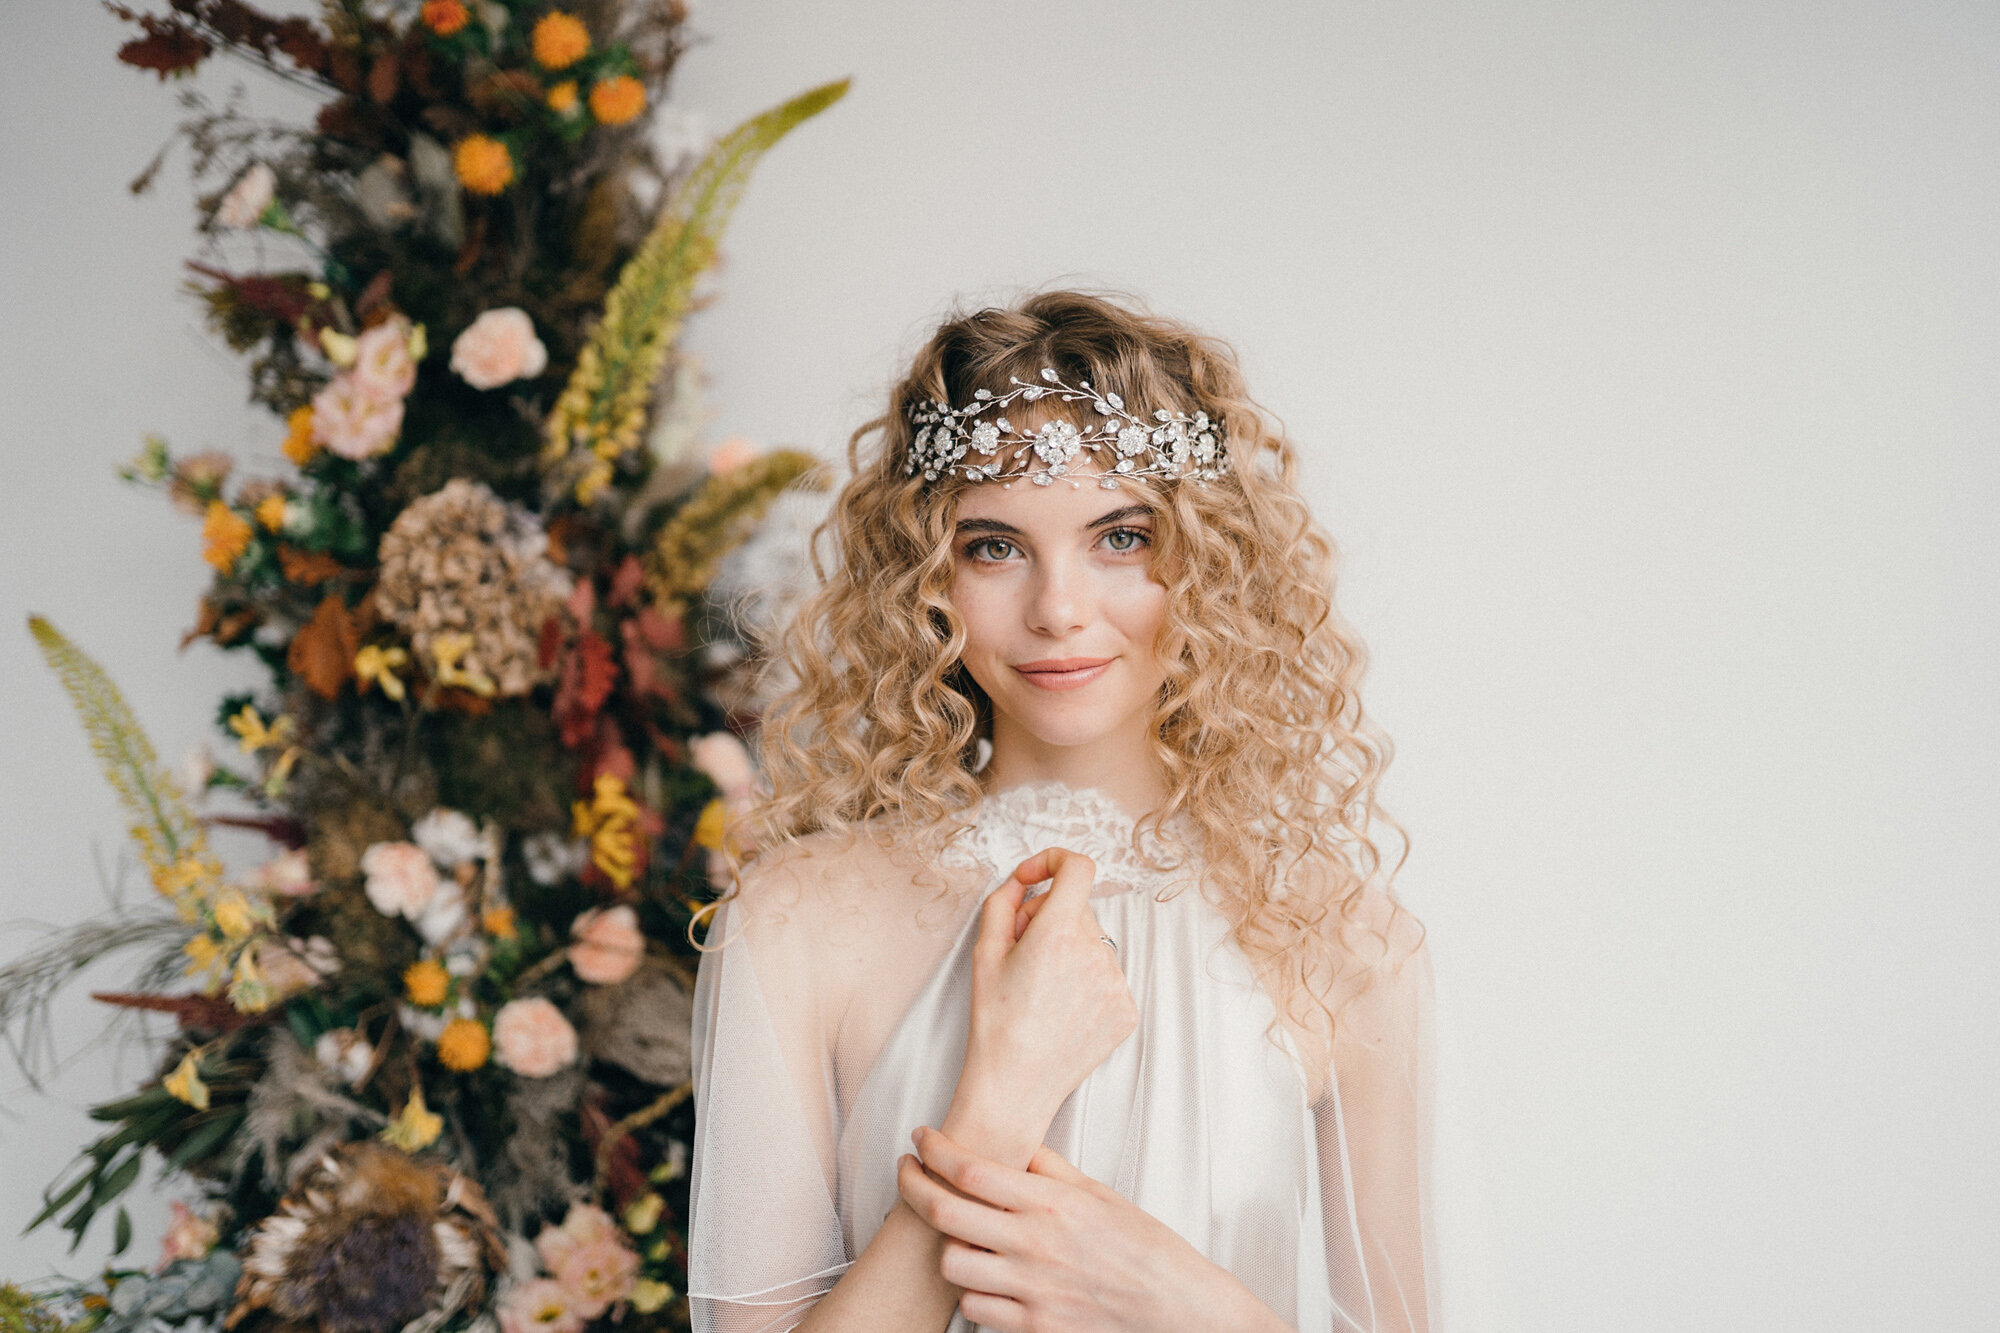 Debbie-Carlisle-Bridal-Accessories-Kate-Beaumont-Wedding-Gowns-Sheffield-Yorkshire-UK-17.jpg